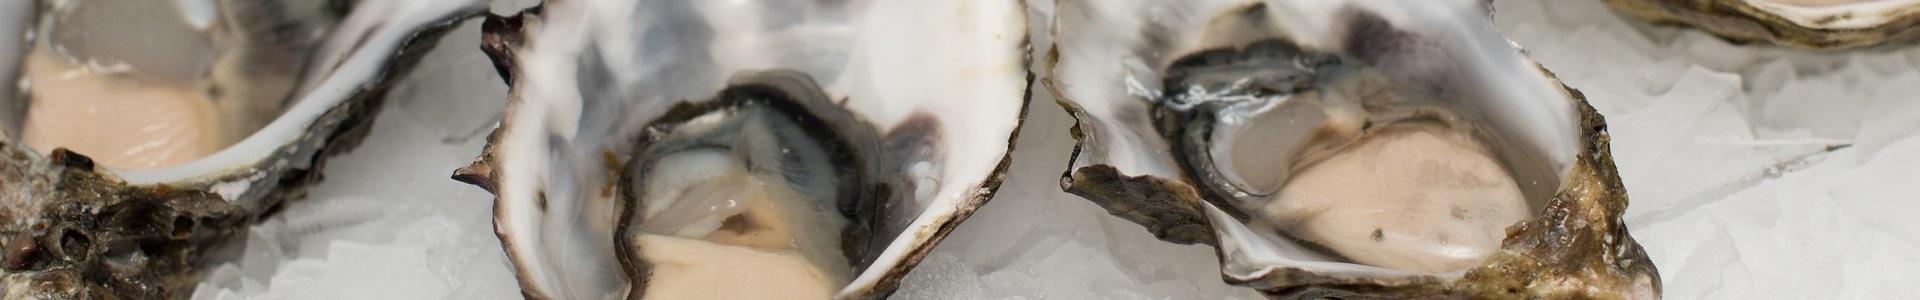 shellfish iodine source